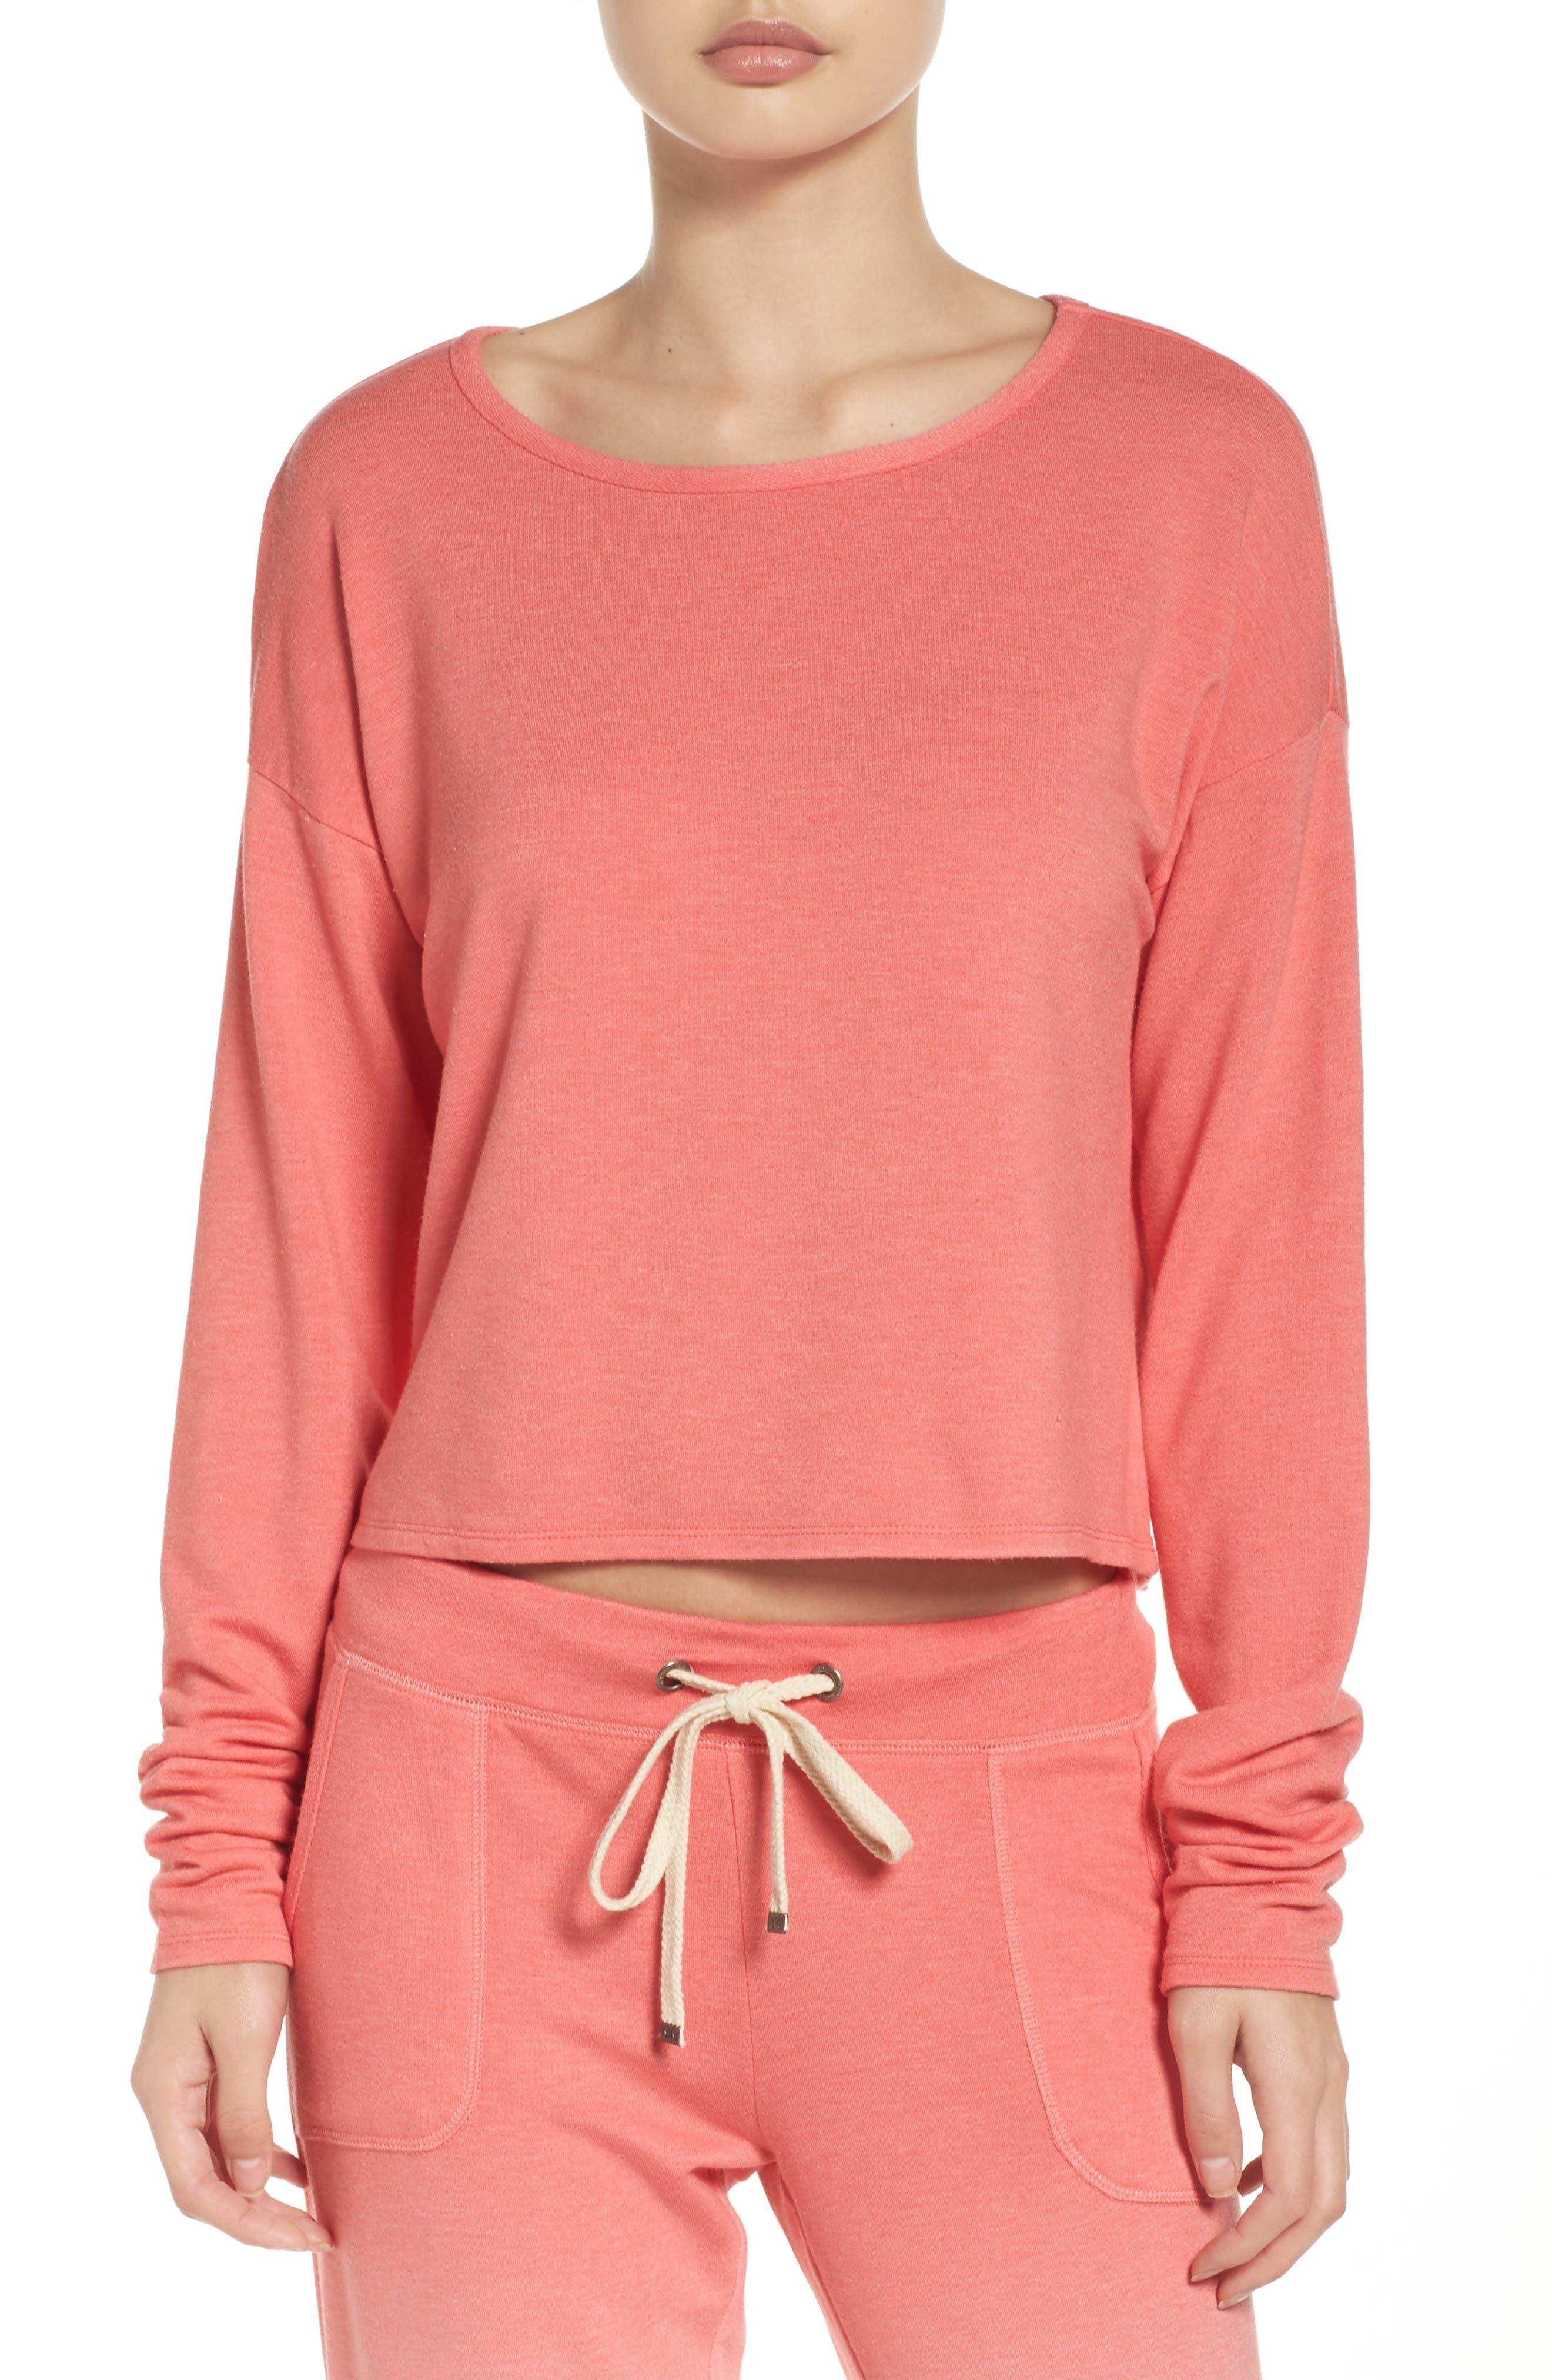 Alternate Image 1 Selected - Make + Model Sunrise Sweatshirt